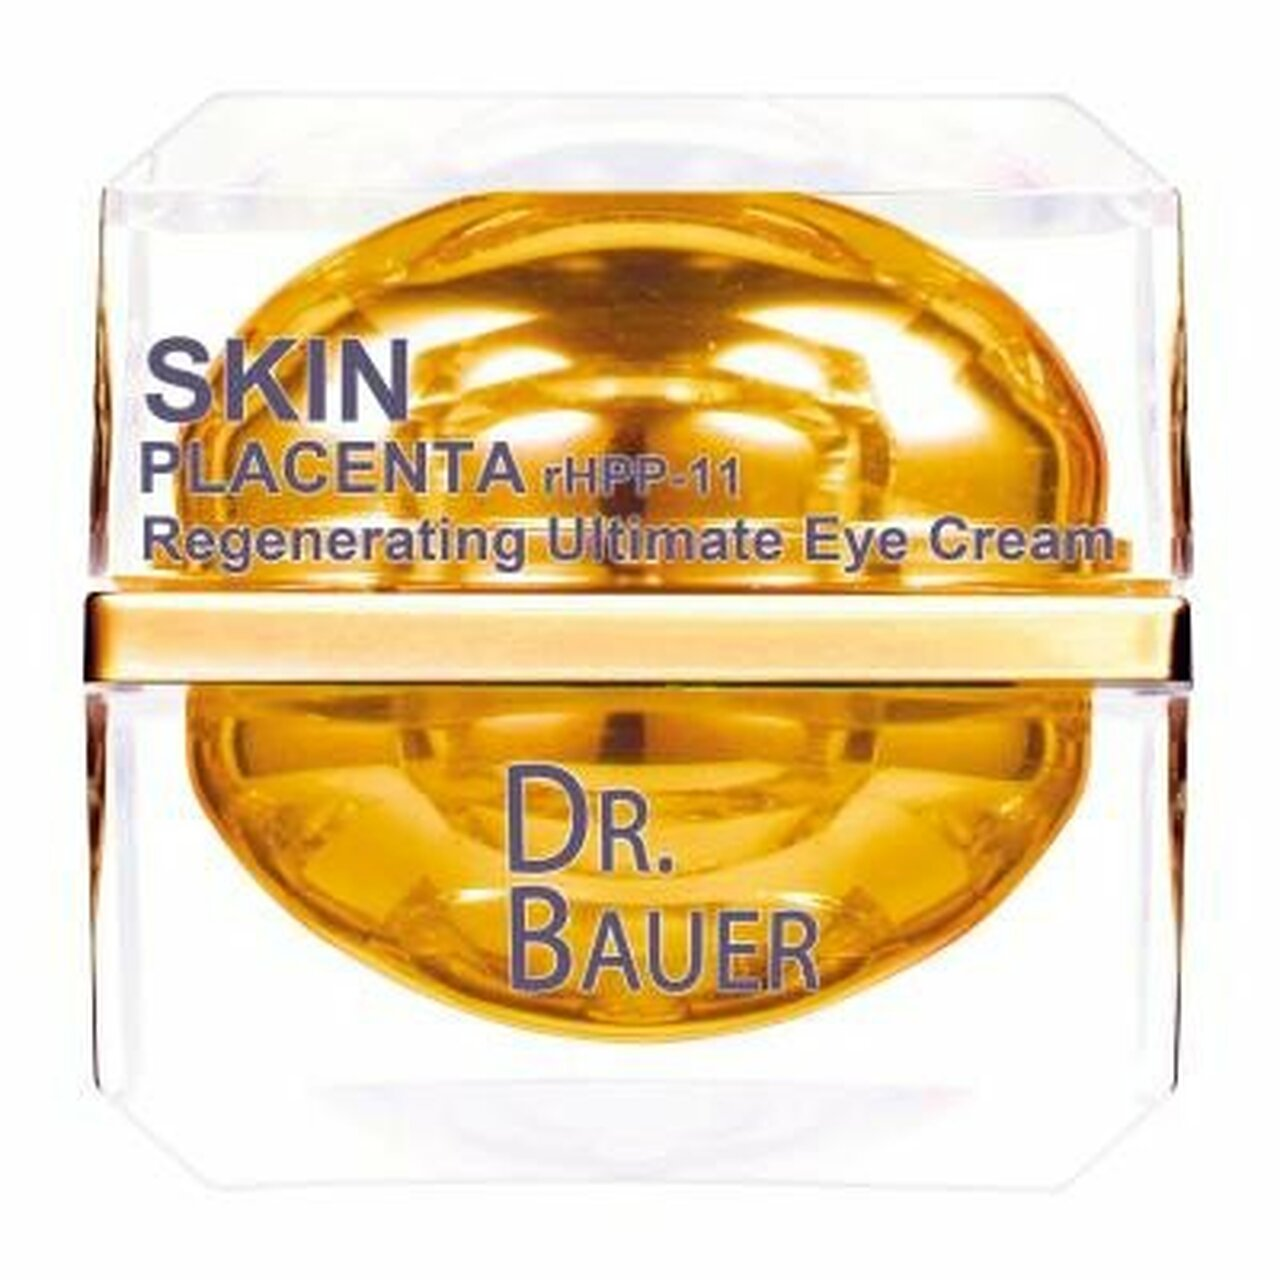 Dr. Bauer Skin Placenta Rhpp-11 Regenerating Ultimate Eye Cream